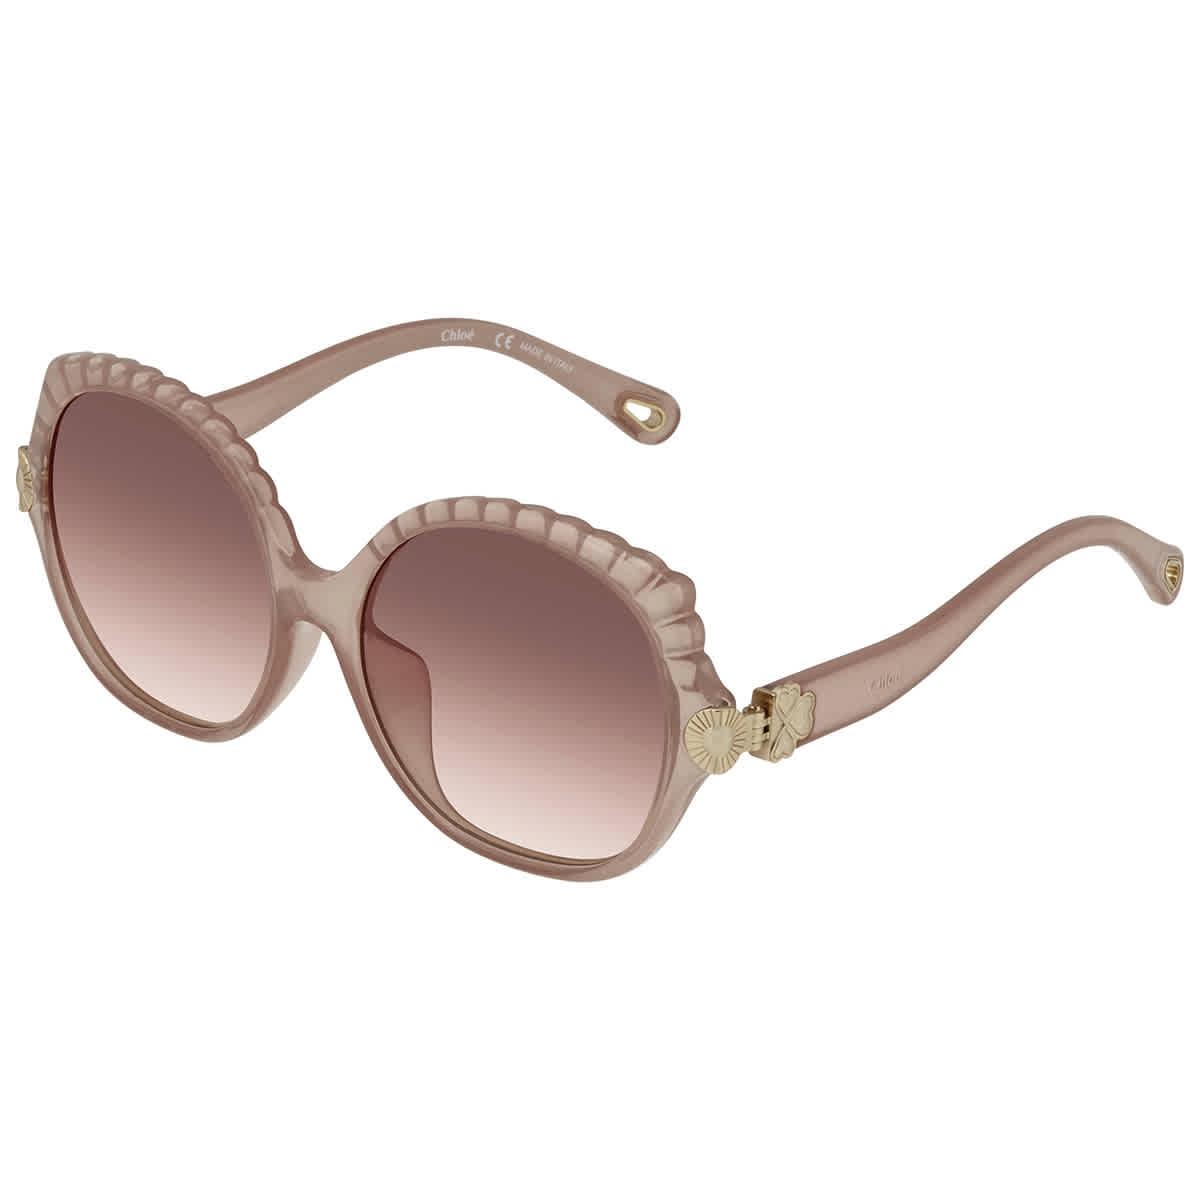 MCM Sunglasses MCM661S 290 NUDE Square Women 53x19x140